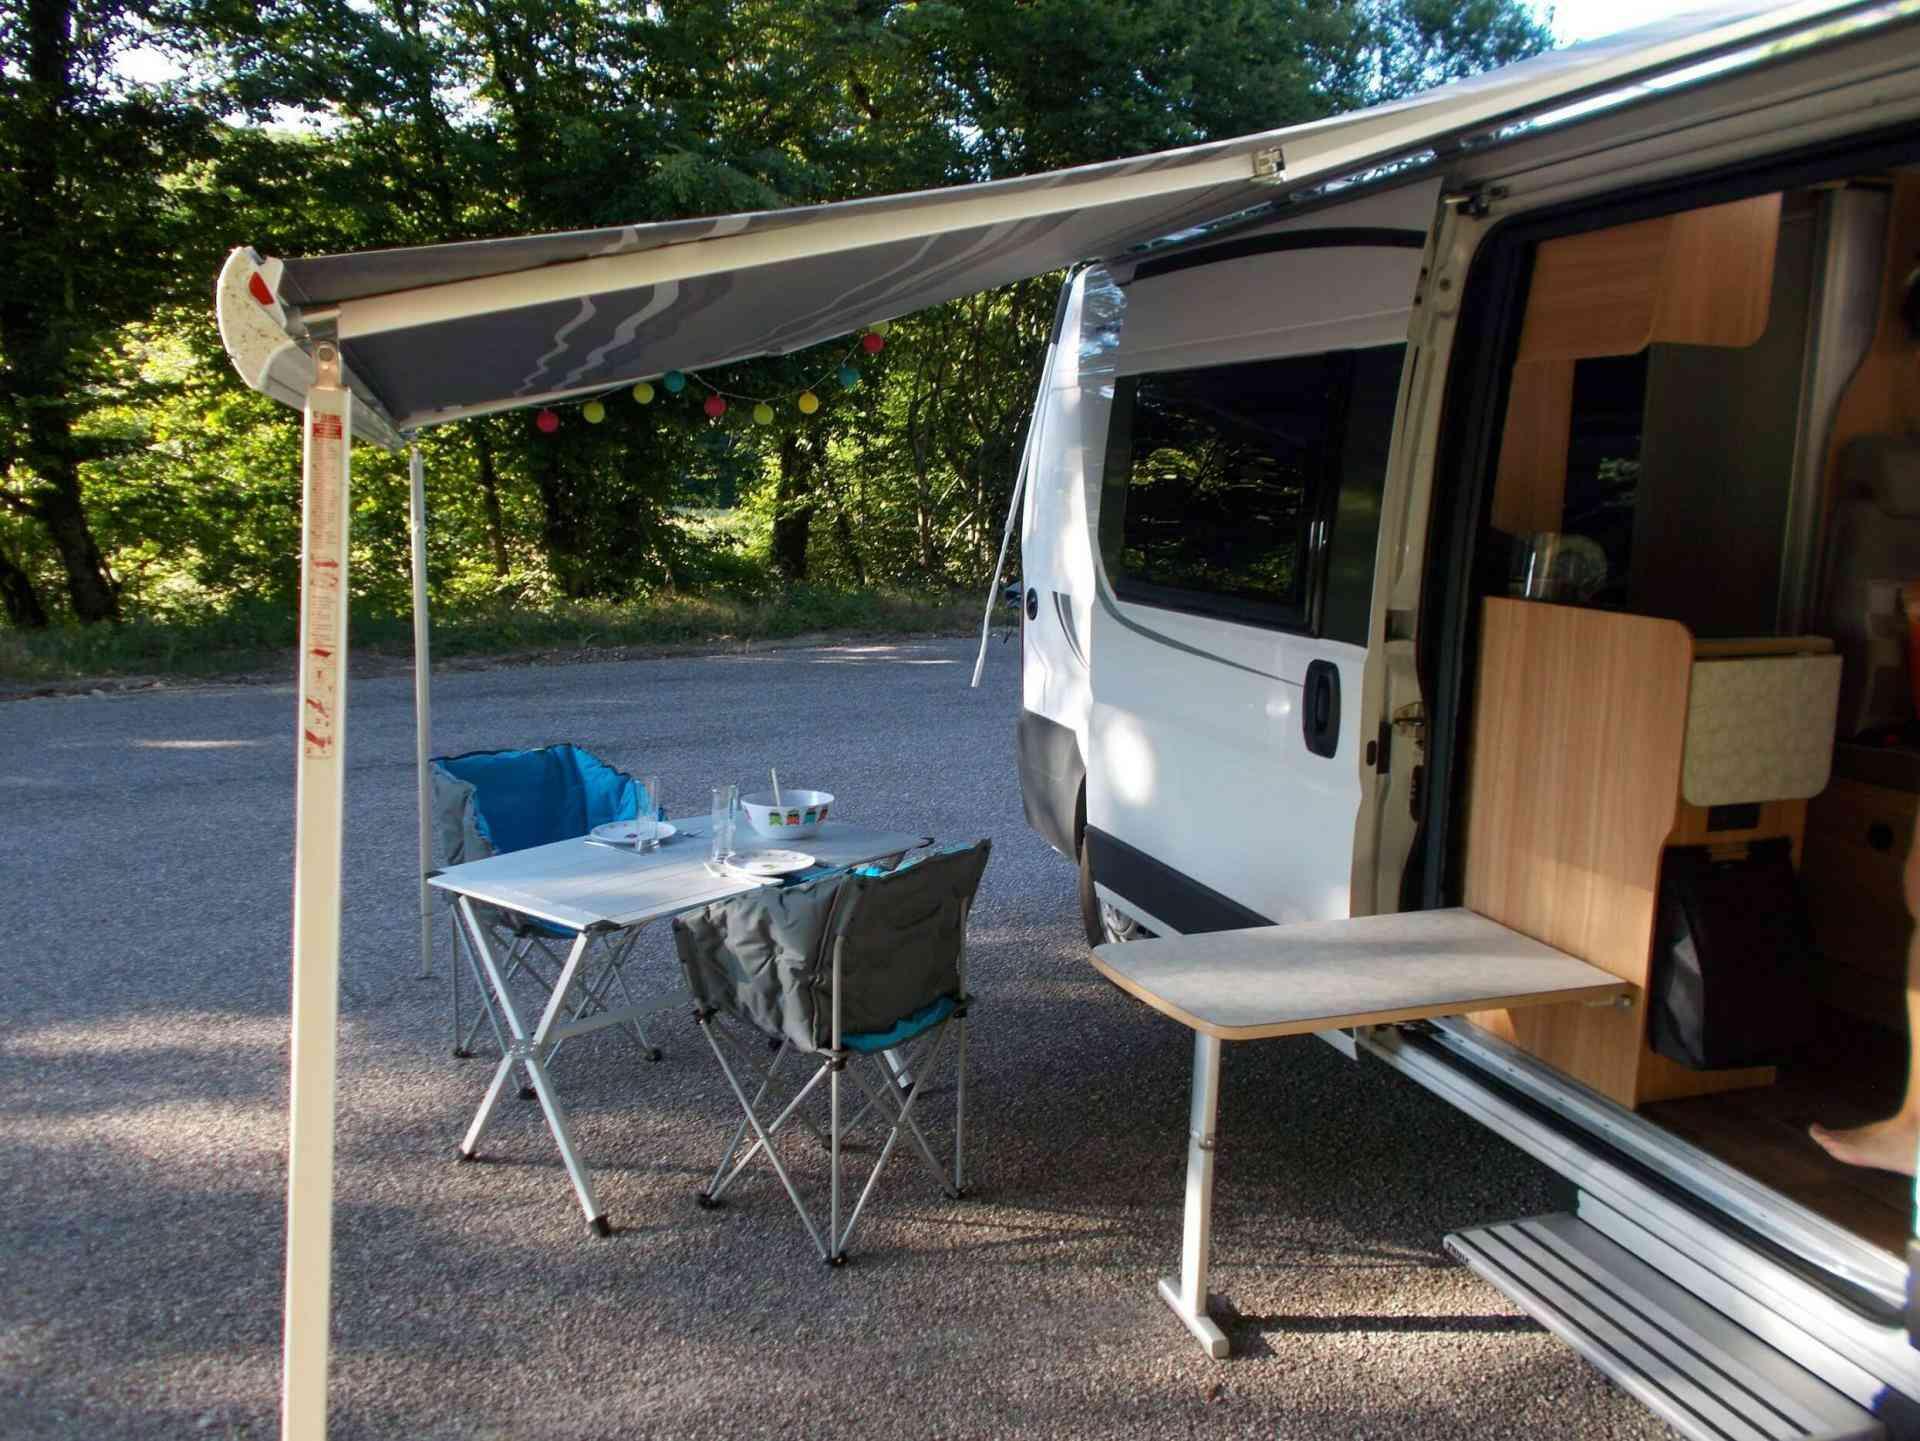 camping-car POSSL 2 WIN R 25 JAHRE